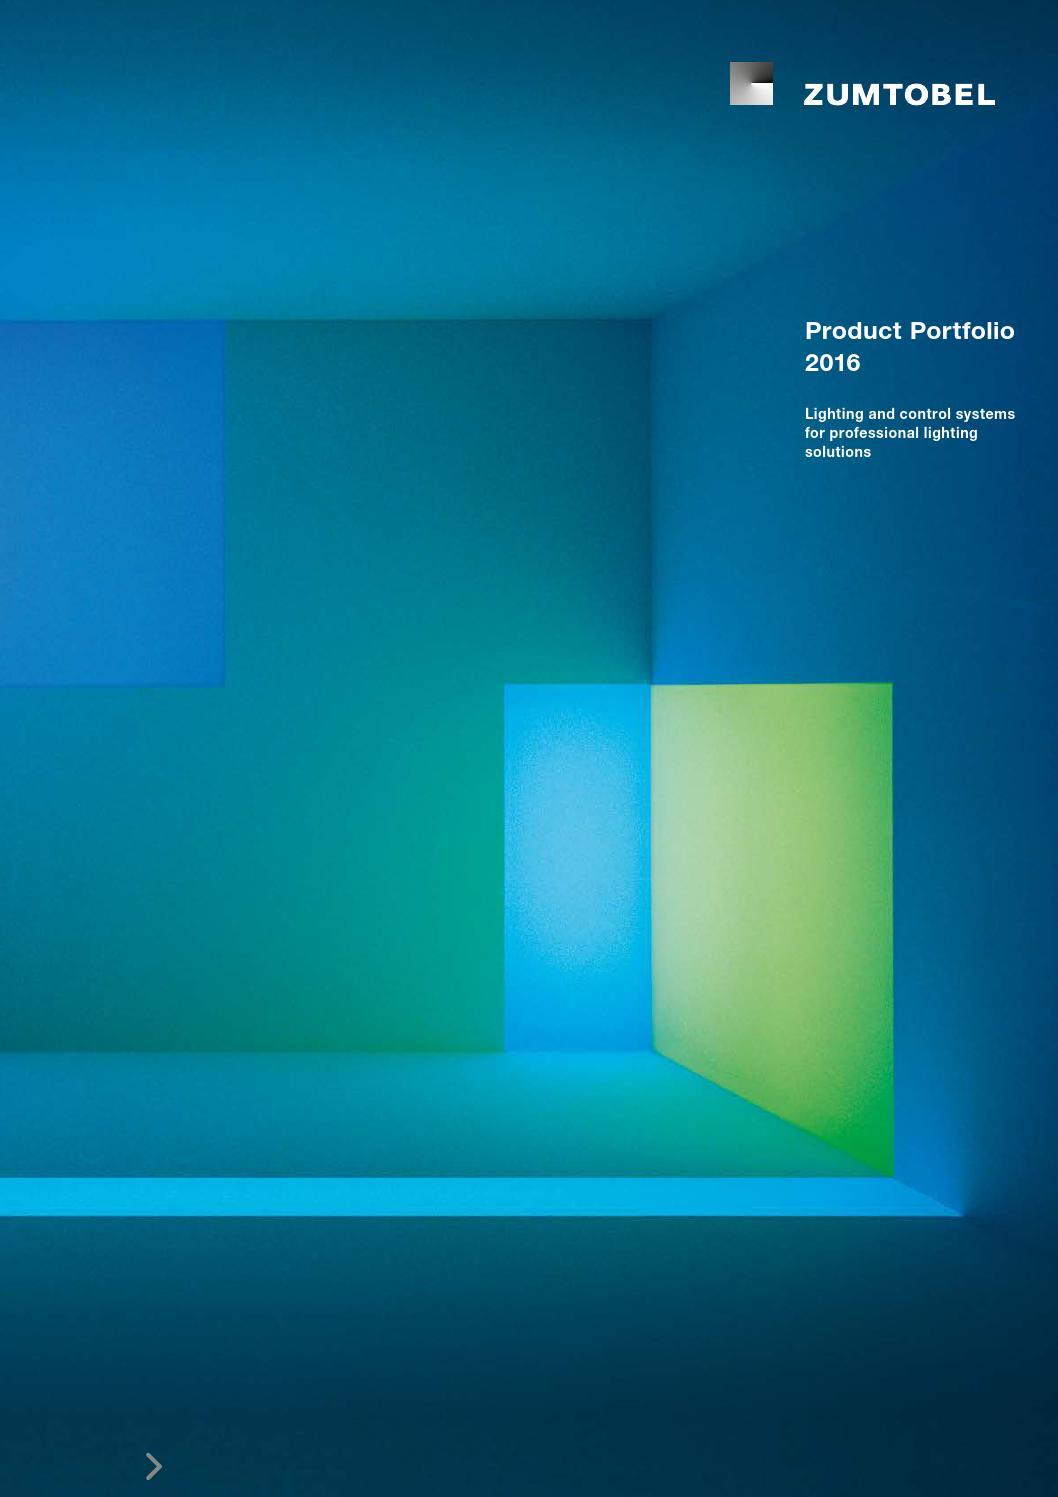 Zumbotel Product Portfolio 2016 By E27 Issuu